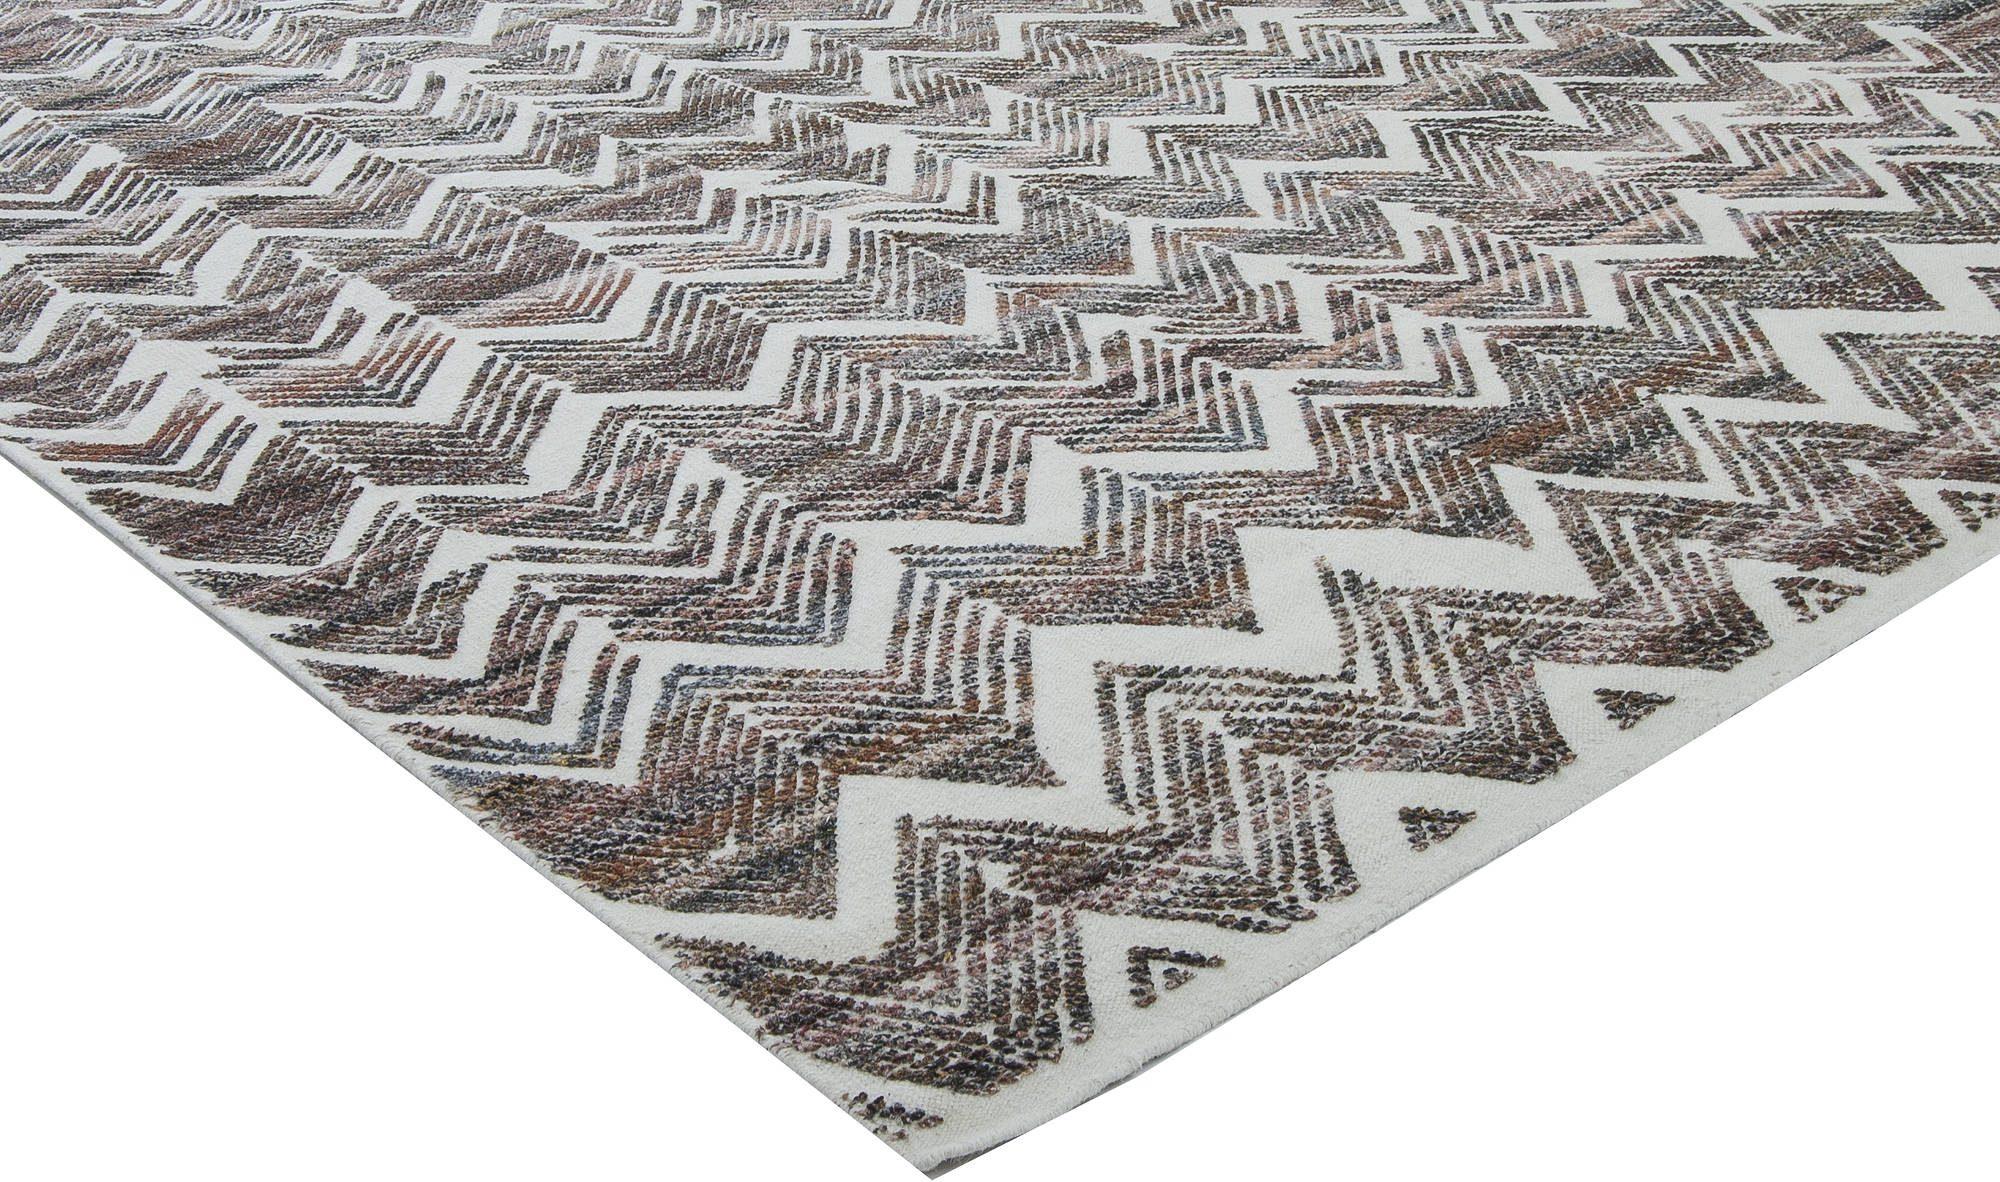 Textured Chevron Rug N11445 By Dlb